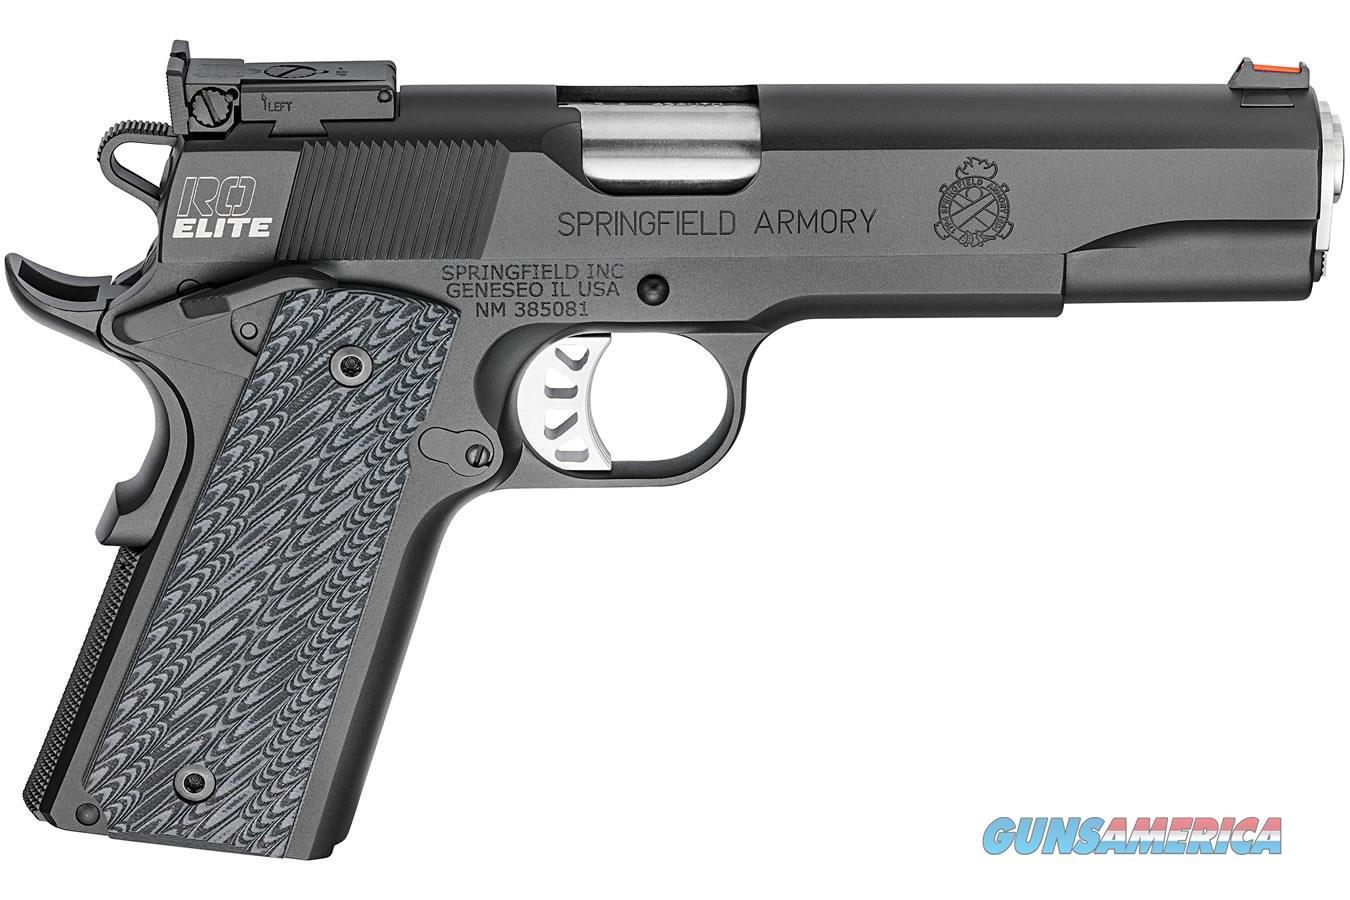 Springfield Armory 1911 Range Officer Elite Target Pistol in 45ACP  Guns > Pistols > Springfield Armory Pistols > 1911 Type